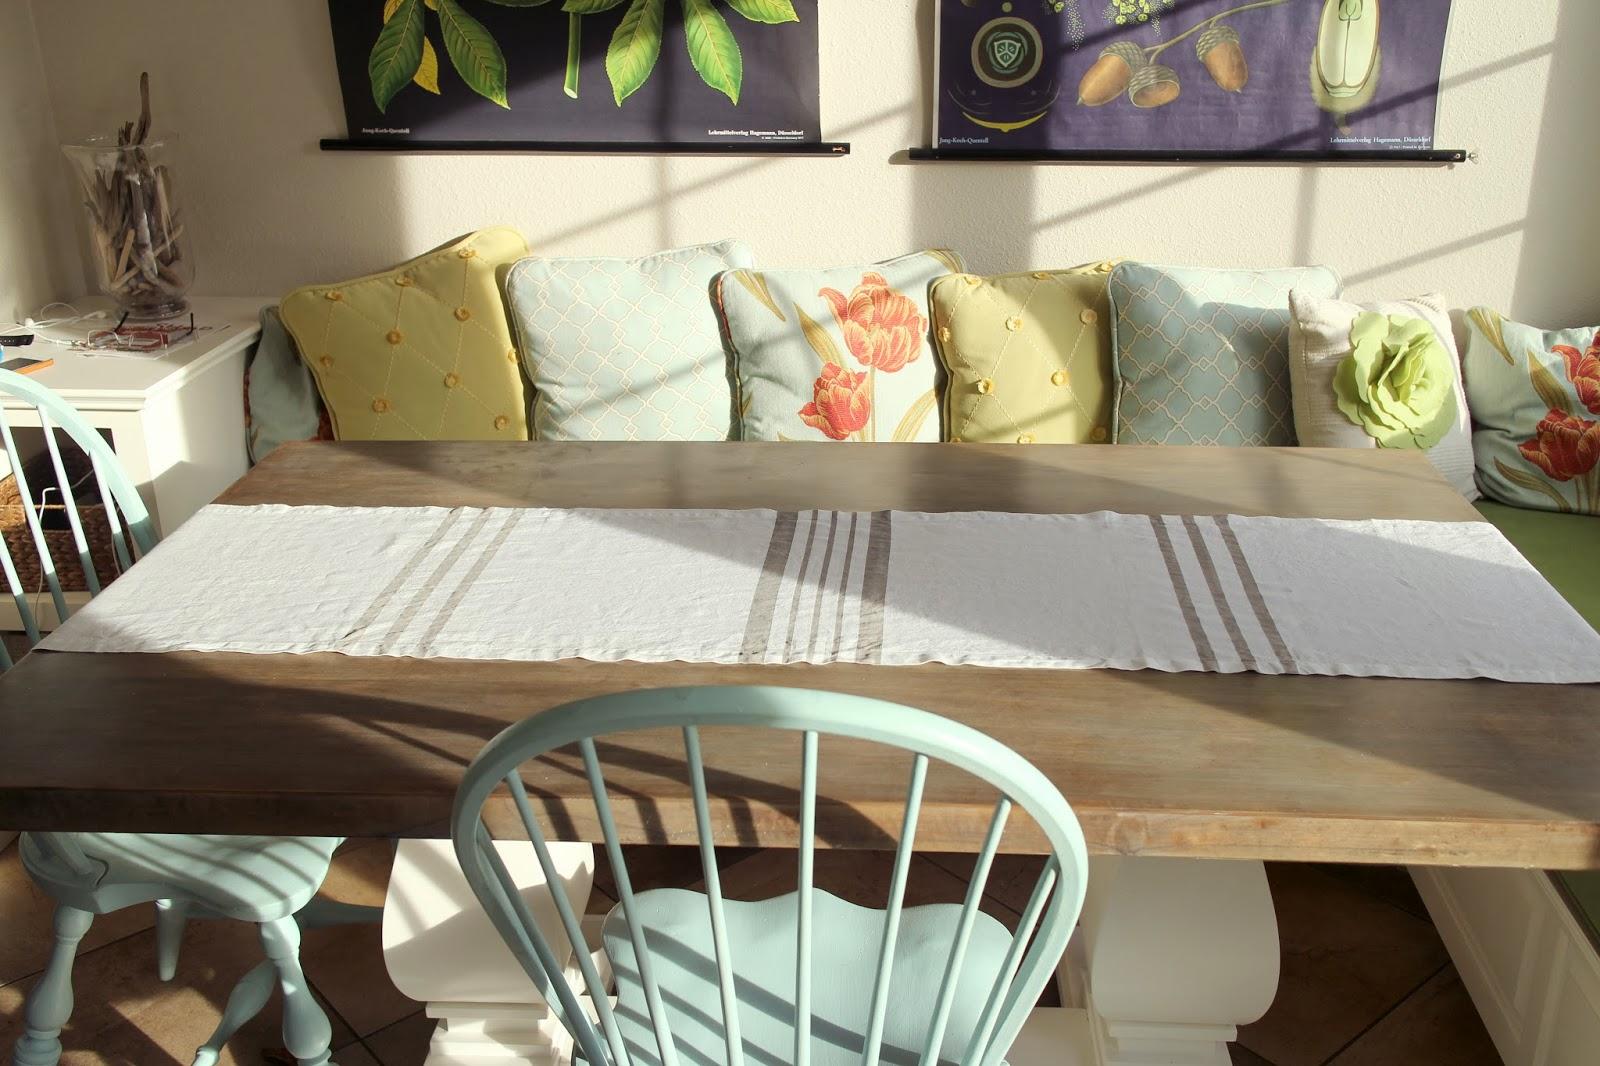 How To Make A Custom Striped Table Runner The Impatient Gardener - Custom dining room table runners